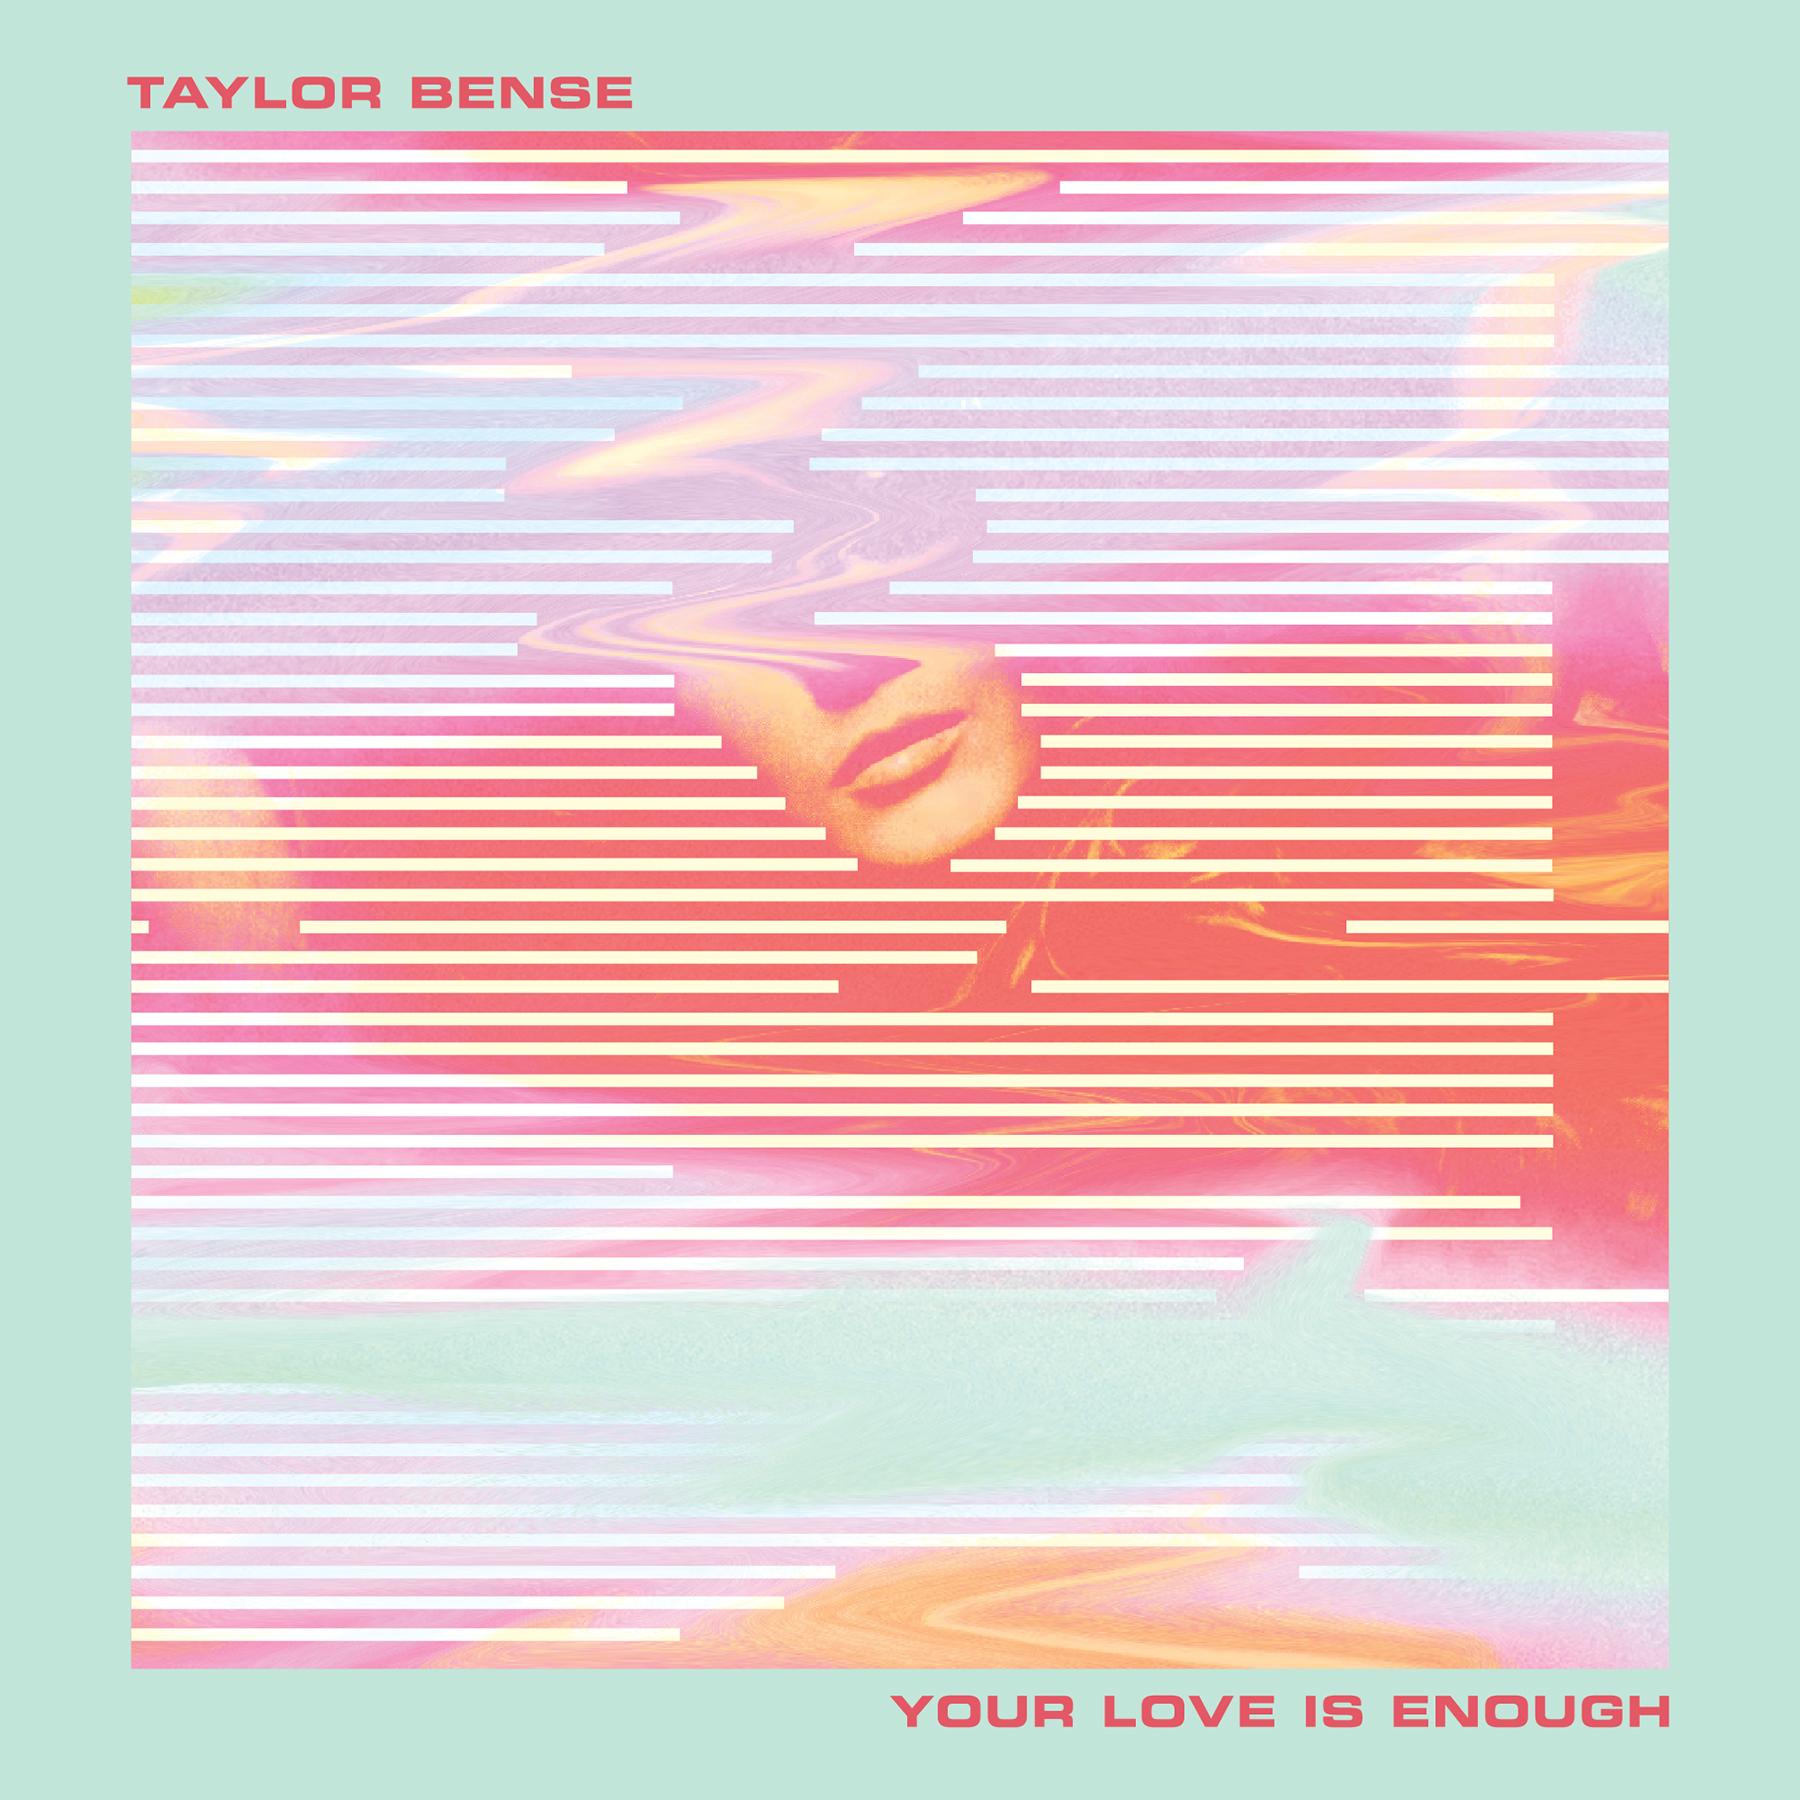 TaylorBense_YourLove_Final-Digital-1800x1800px.jpg